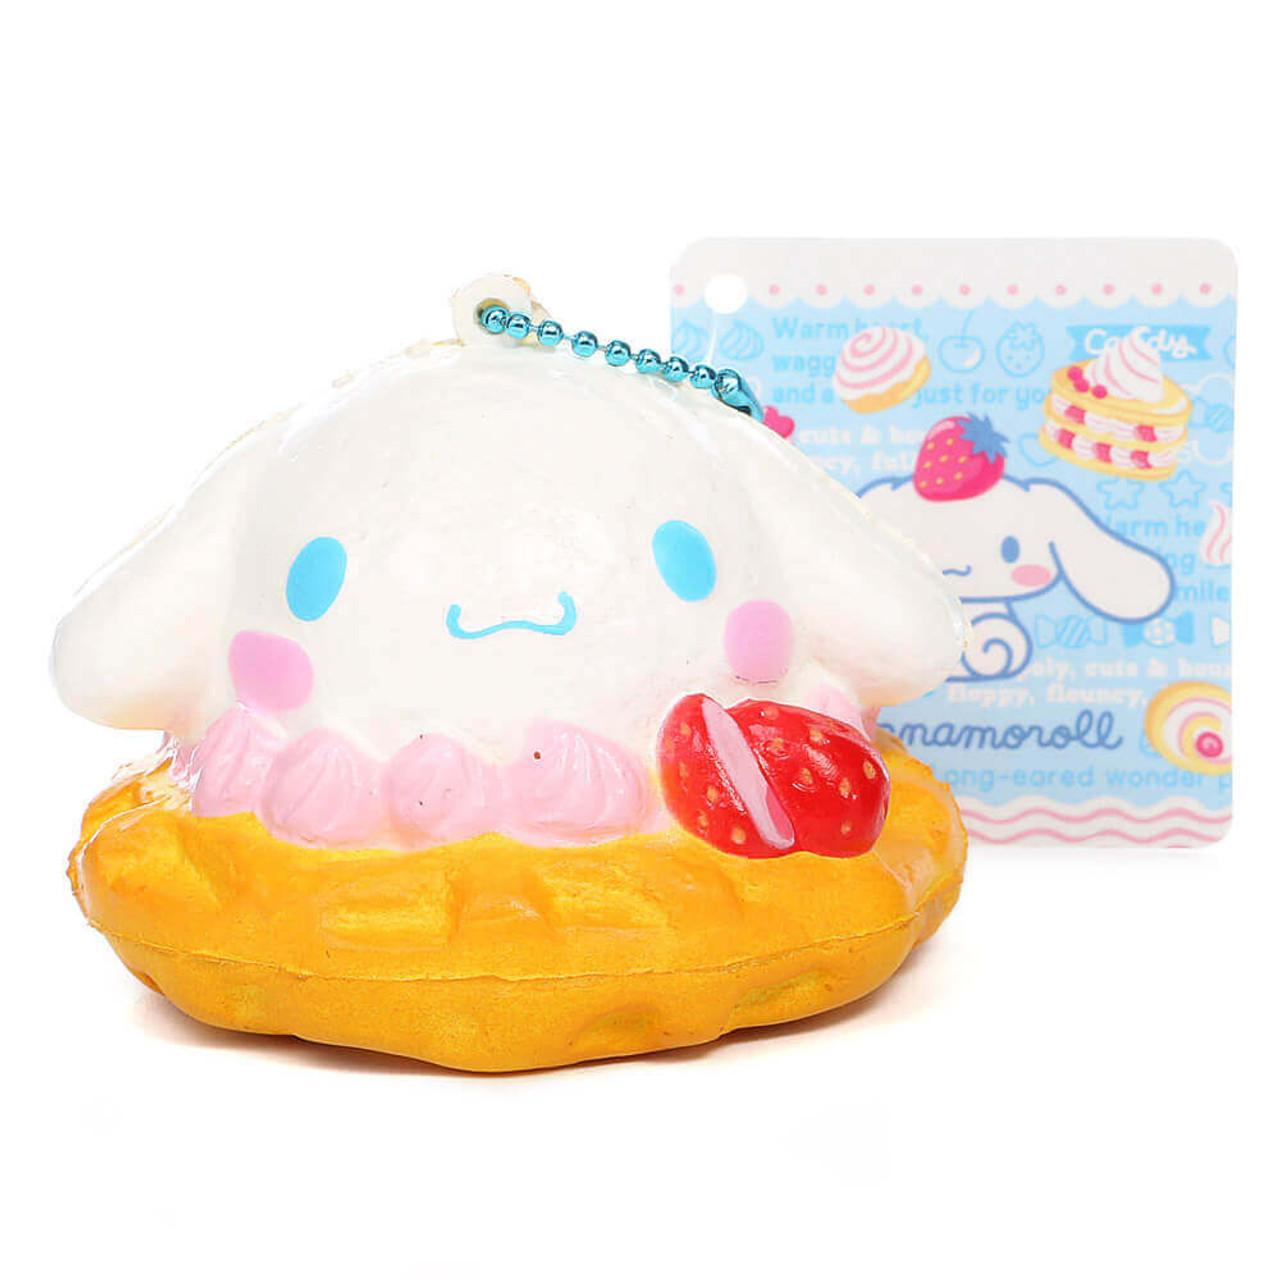 Sanrio Cinnamoroll Kawaii Mascot Waffle Cream Dessert Soft Squishy Charms ( Front View )